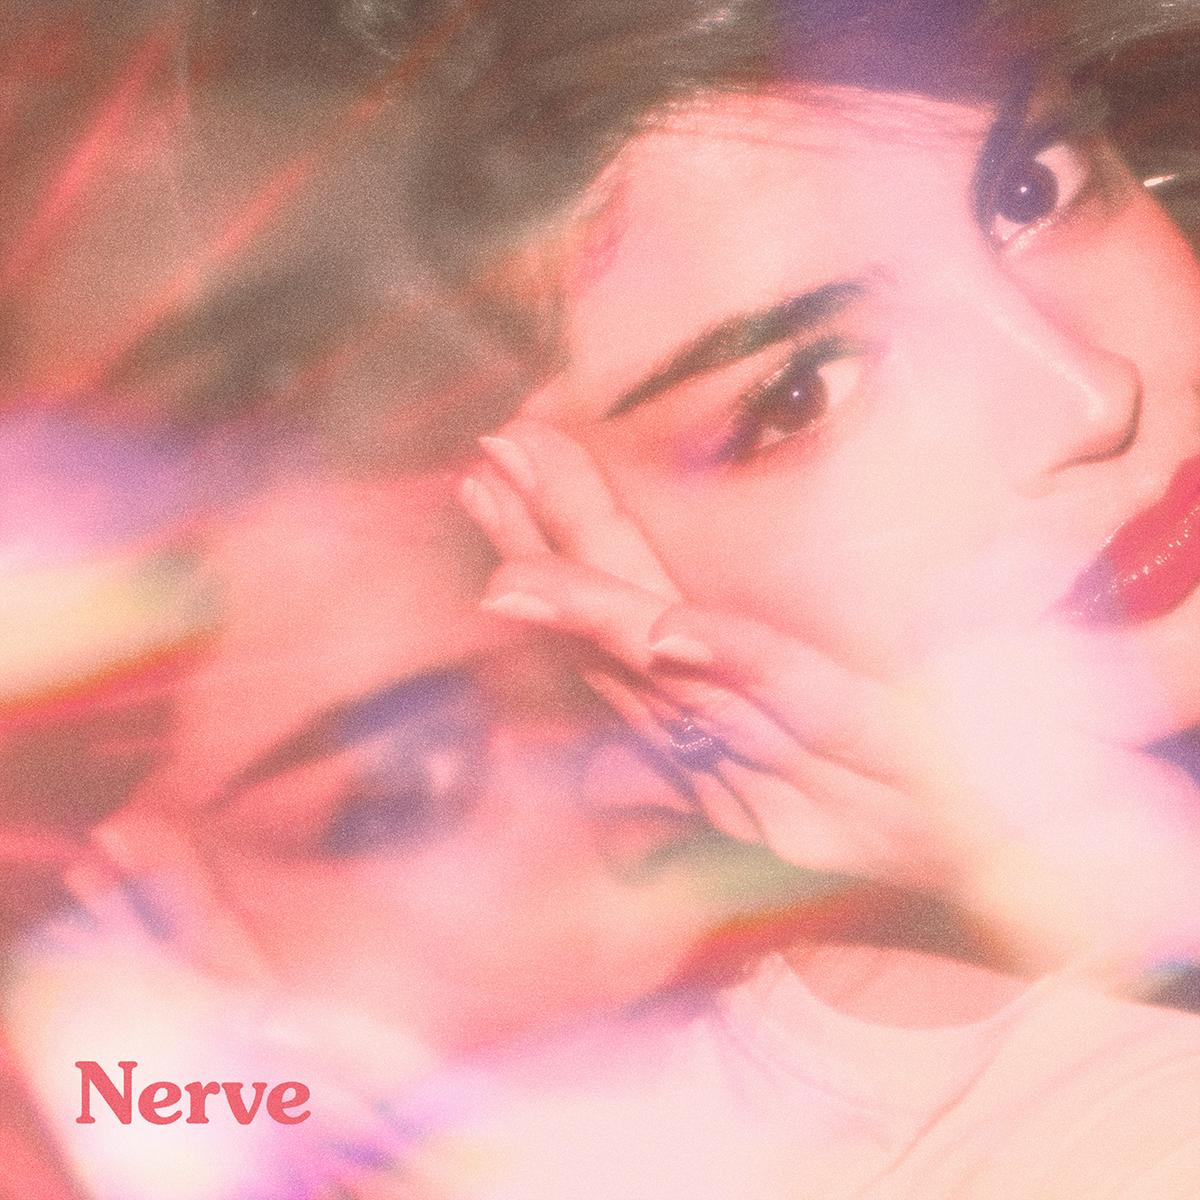 Nikki Yanofsky Releases New Song Nerve